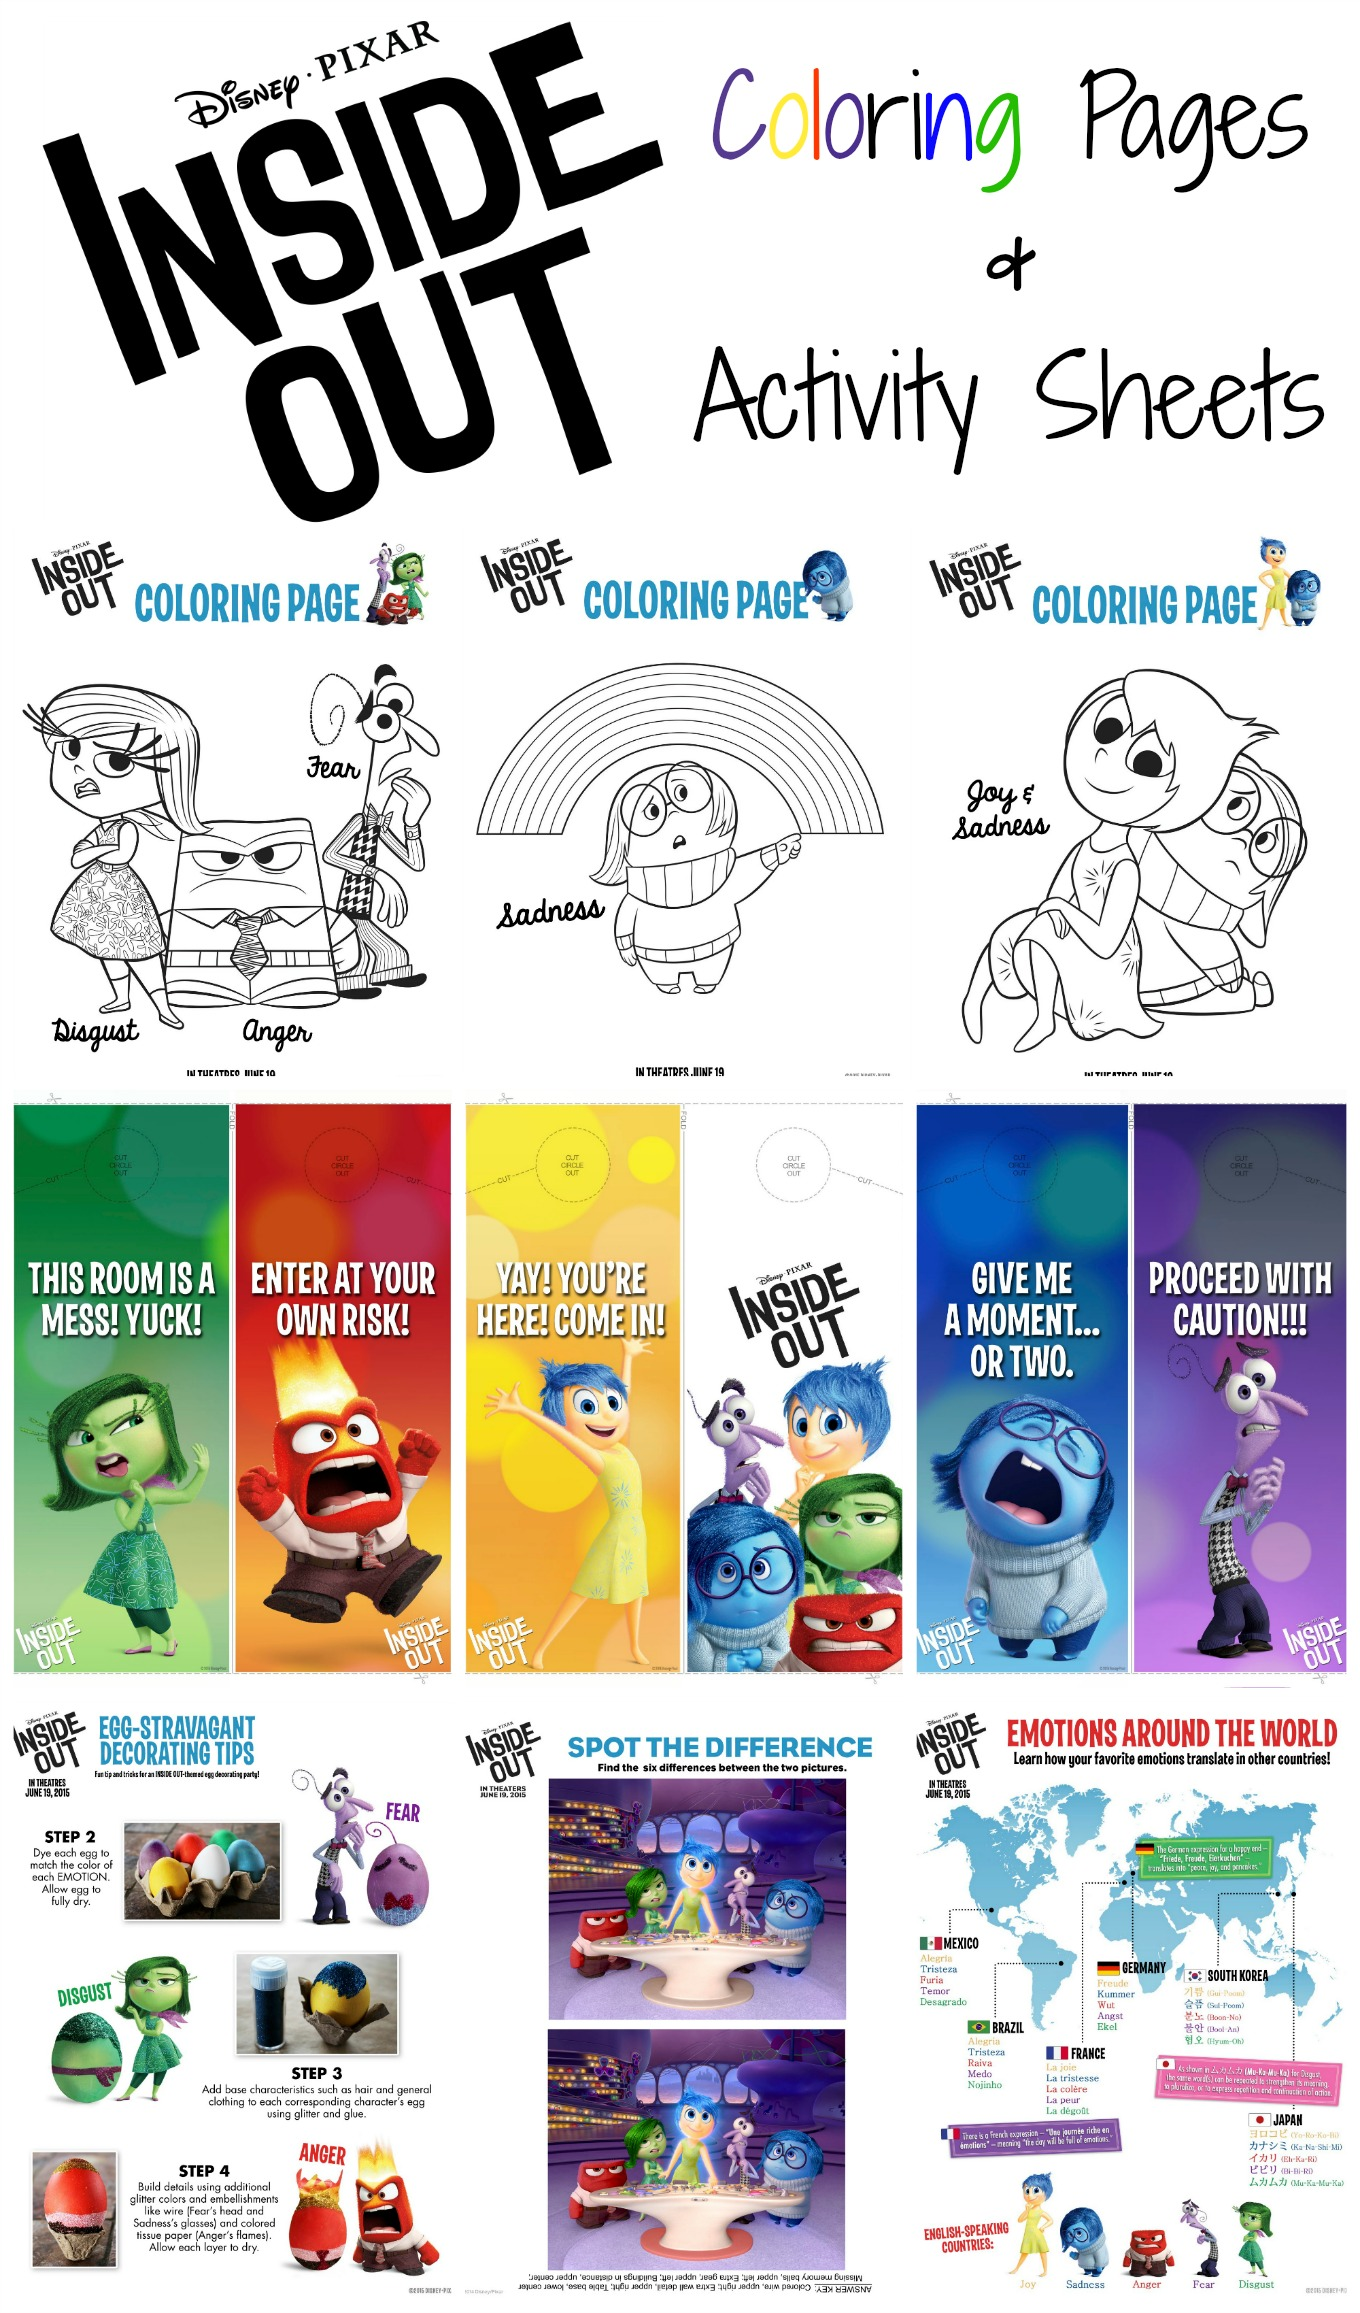 Disney Pixar Inside Out Activity Sheets Eclectic Momsense